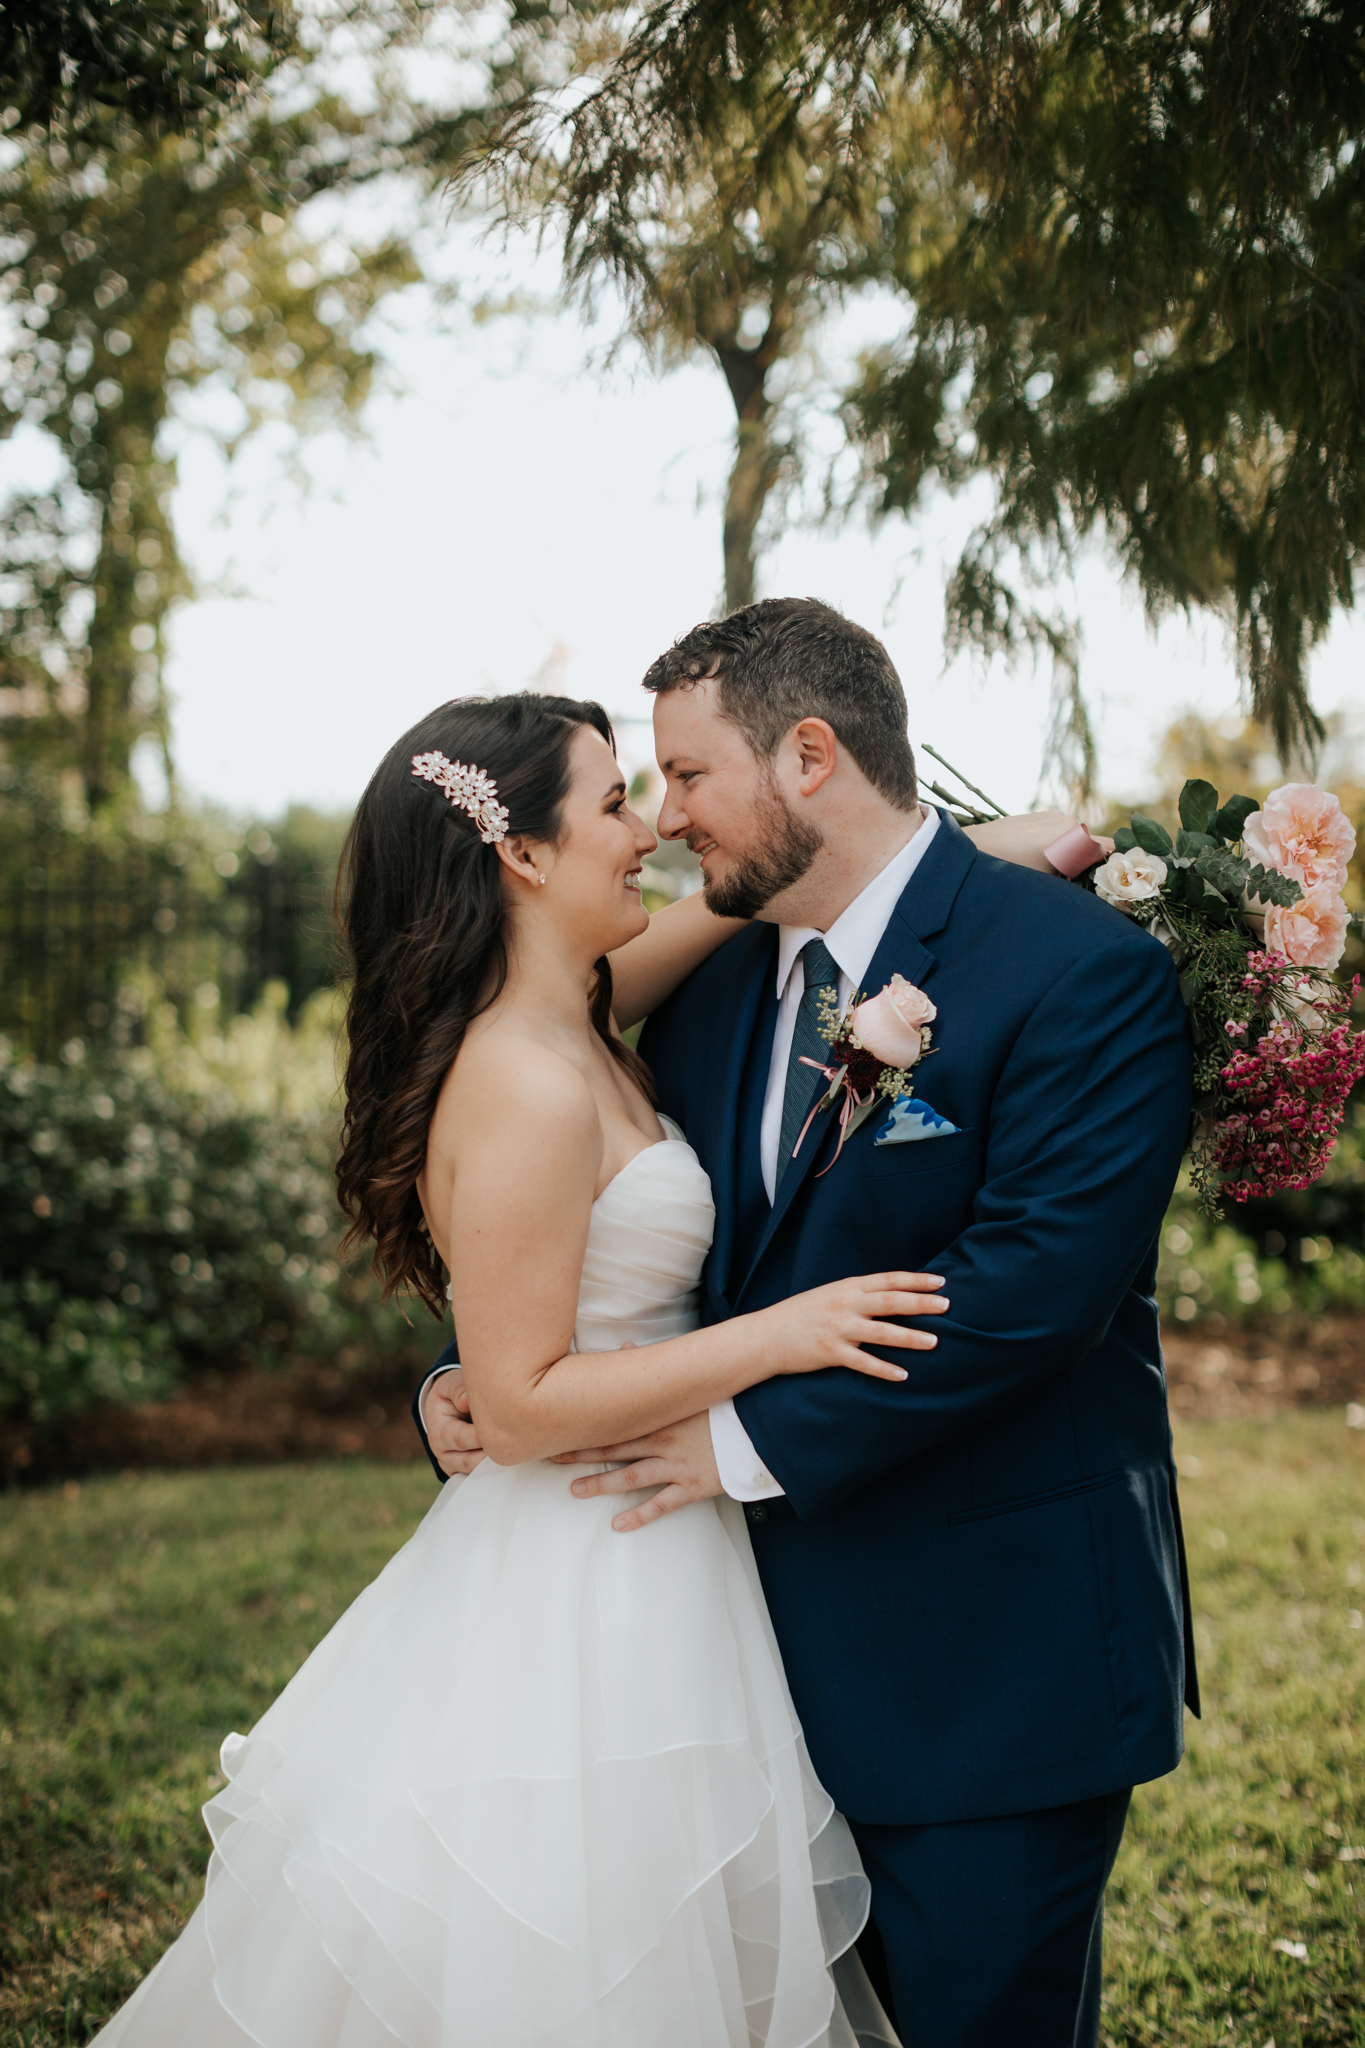 Leah Nicole Photography - Houston Wedding Photographer-Lake Conroe Wedding- Houston Wedding Photographer-20.jpg